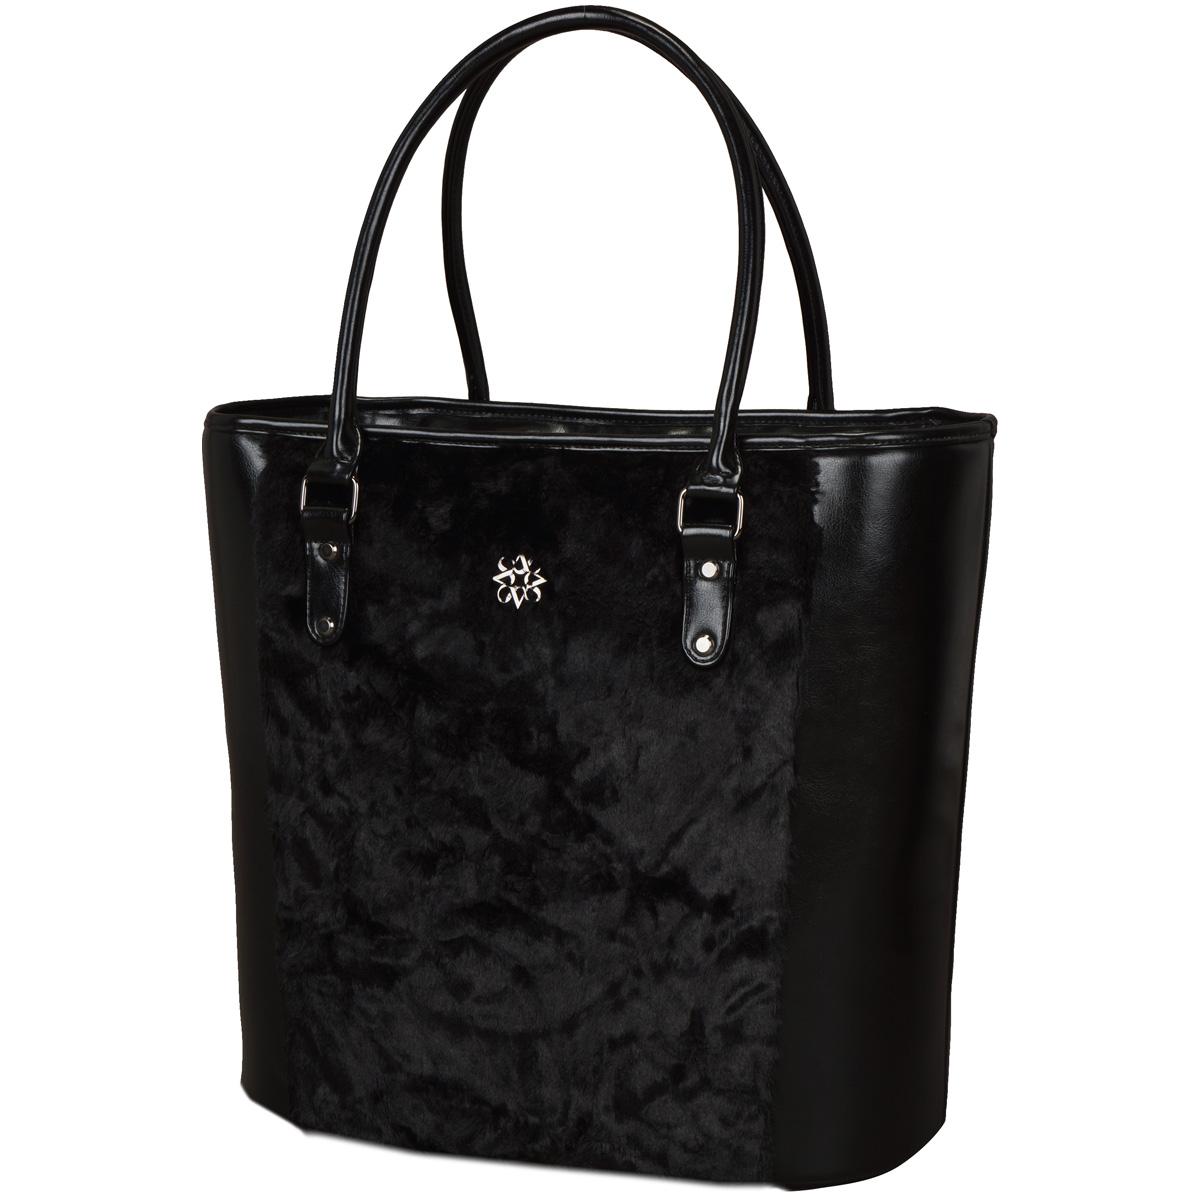 BlackLabel チャーム付きボアカートバッグ